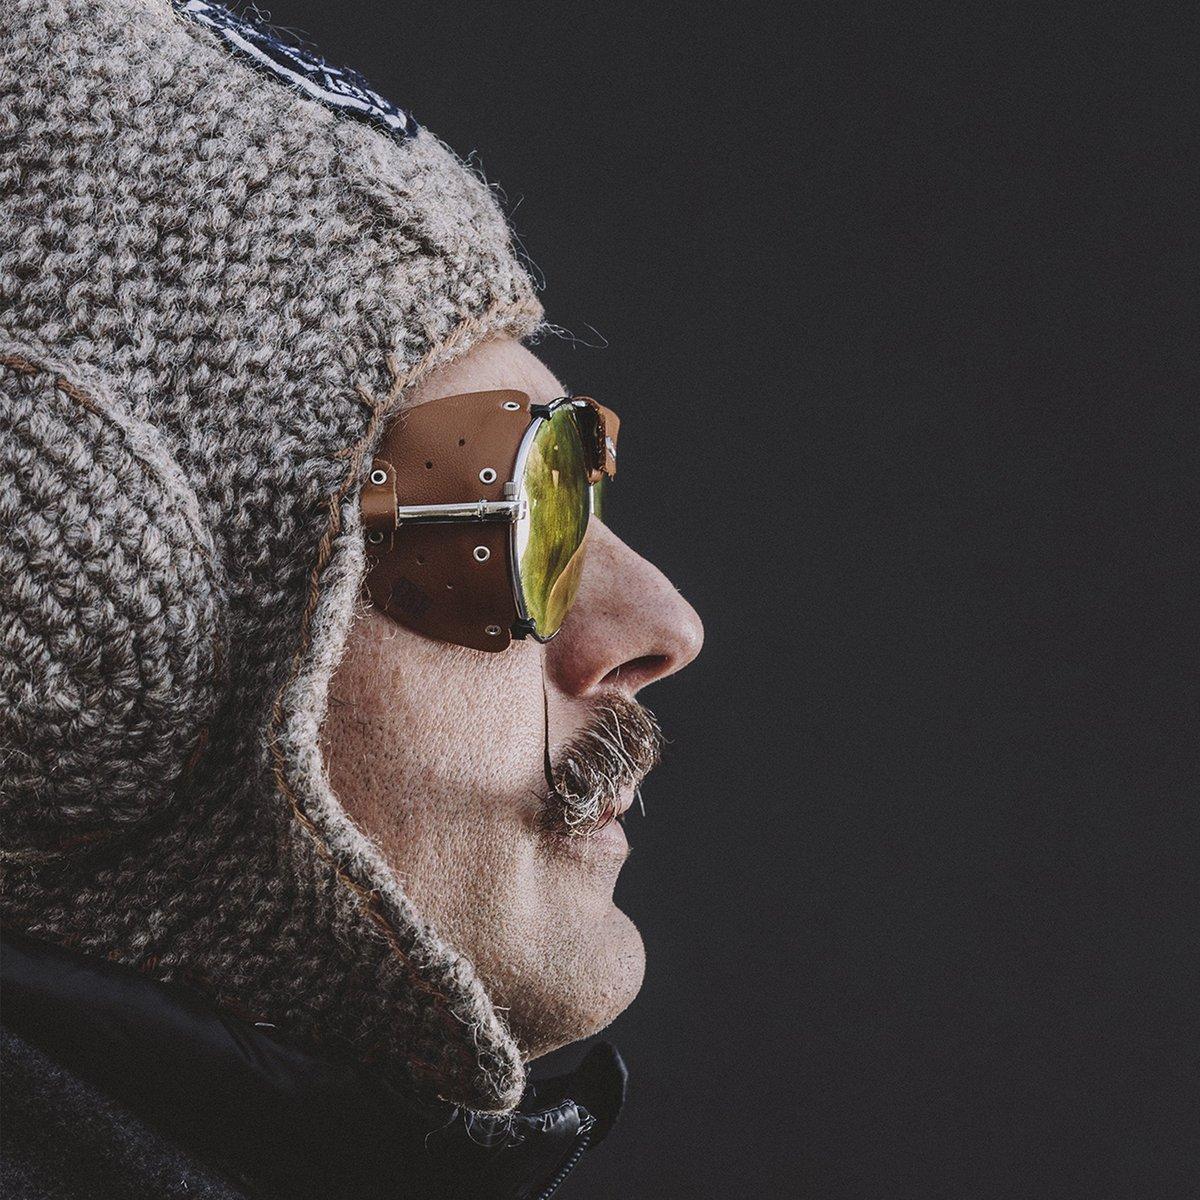 Rancho, the sunnies with a moustache 😎 👉 https   t.co HgnvRYE1El 👈  julbo   julboxrancho  sunglasses https   t.co 2B1bFYXQaA 3b26169a13ce